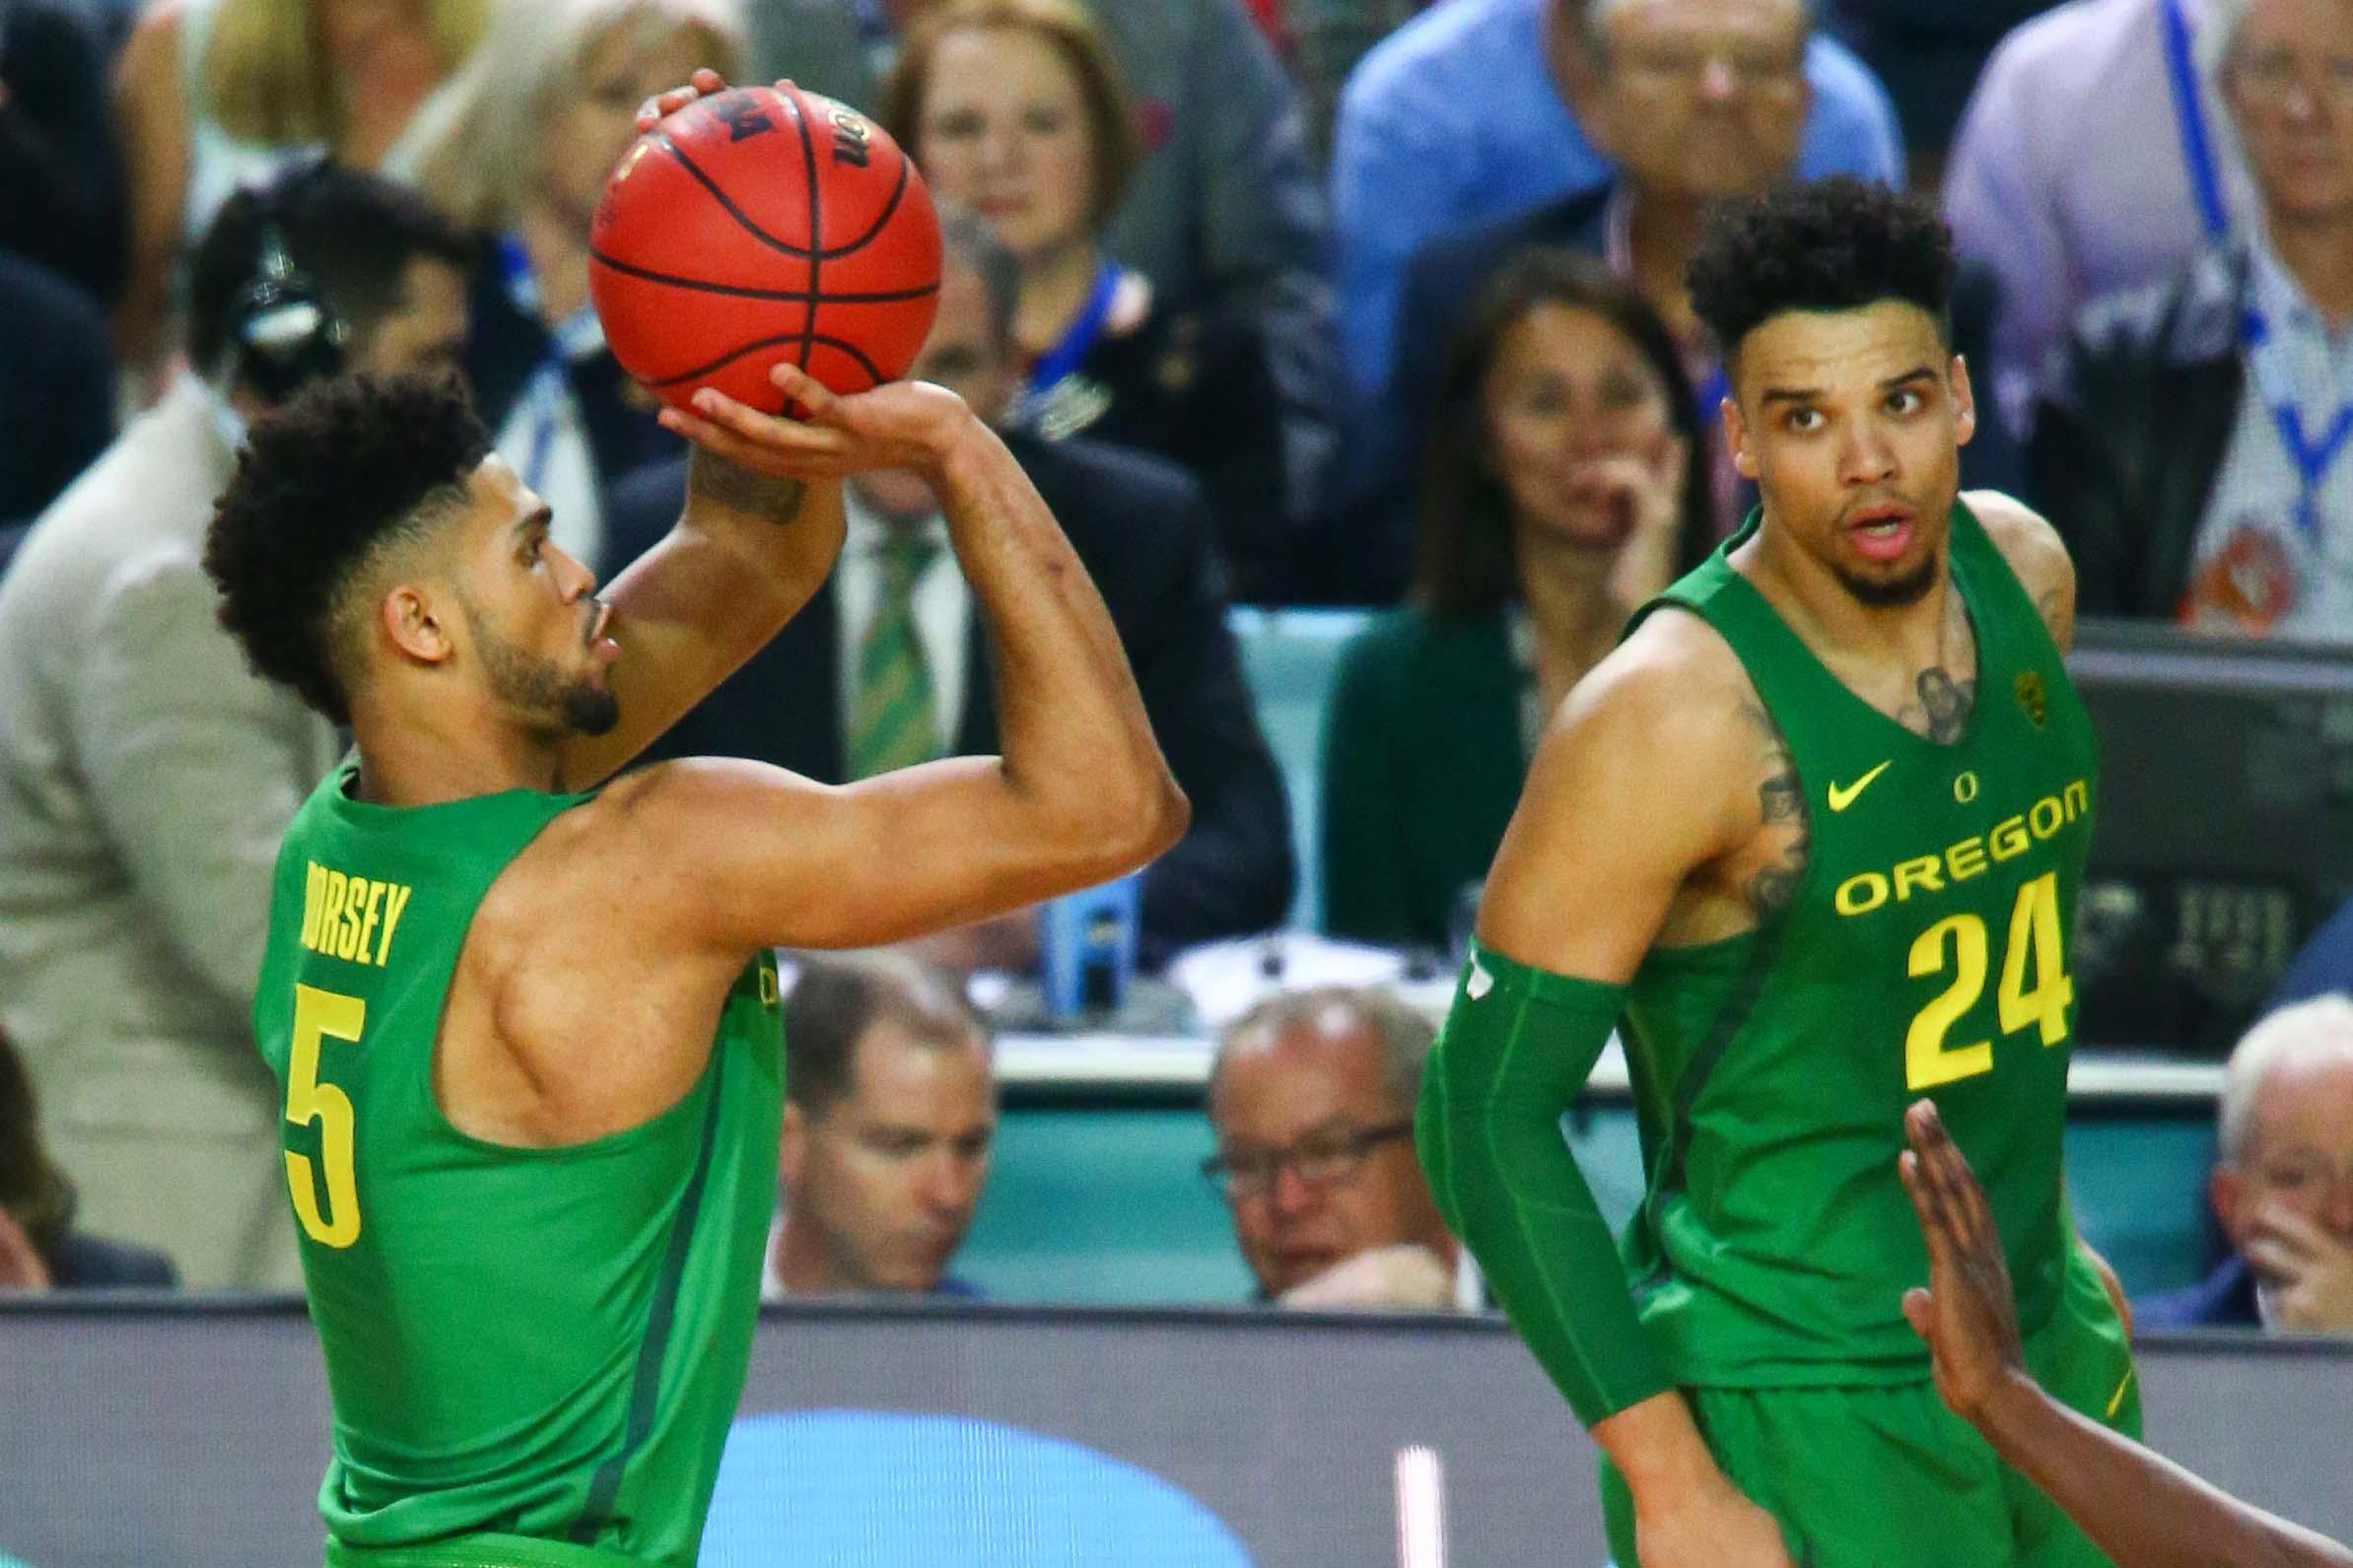 9986709-ncaa-basketball-final-four-oregon-vs-north-carolina